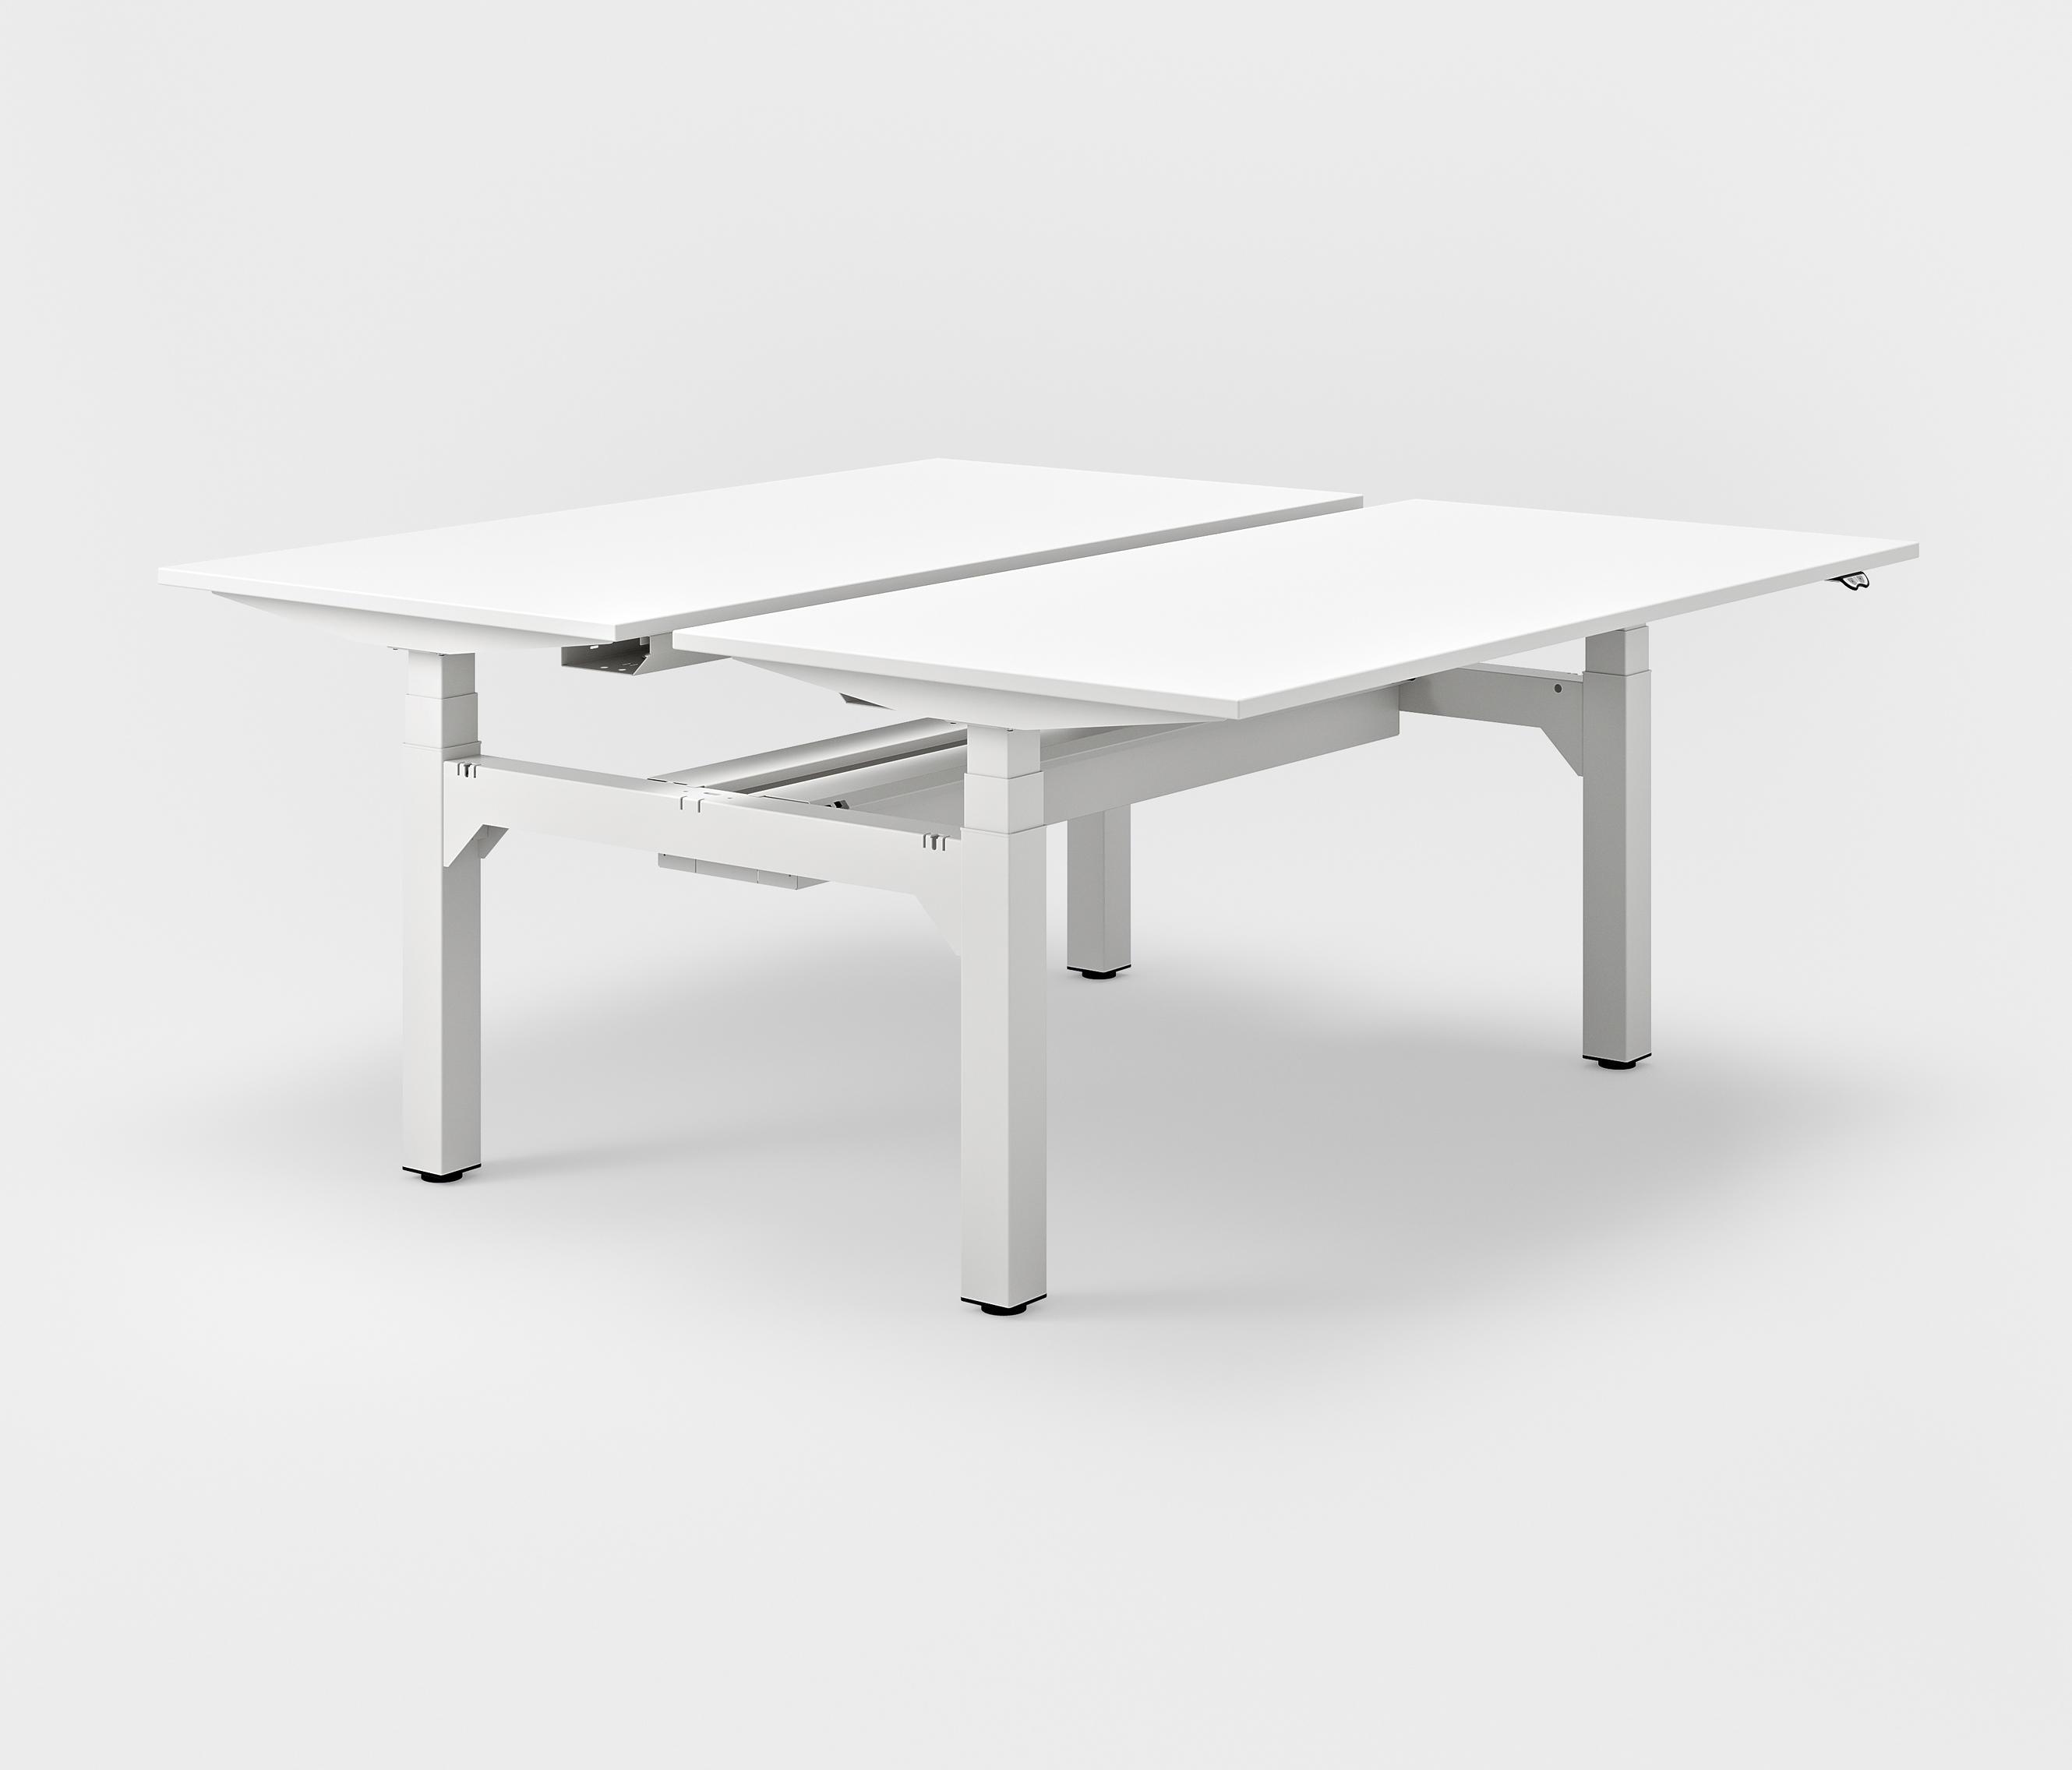 Wondrous Polaris Desks From Kinnarps Architonic Machost Co Dining Chair Design Ideas Machostcouk